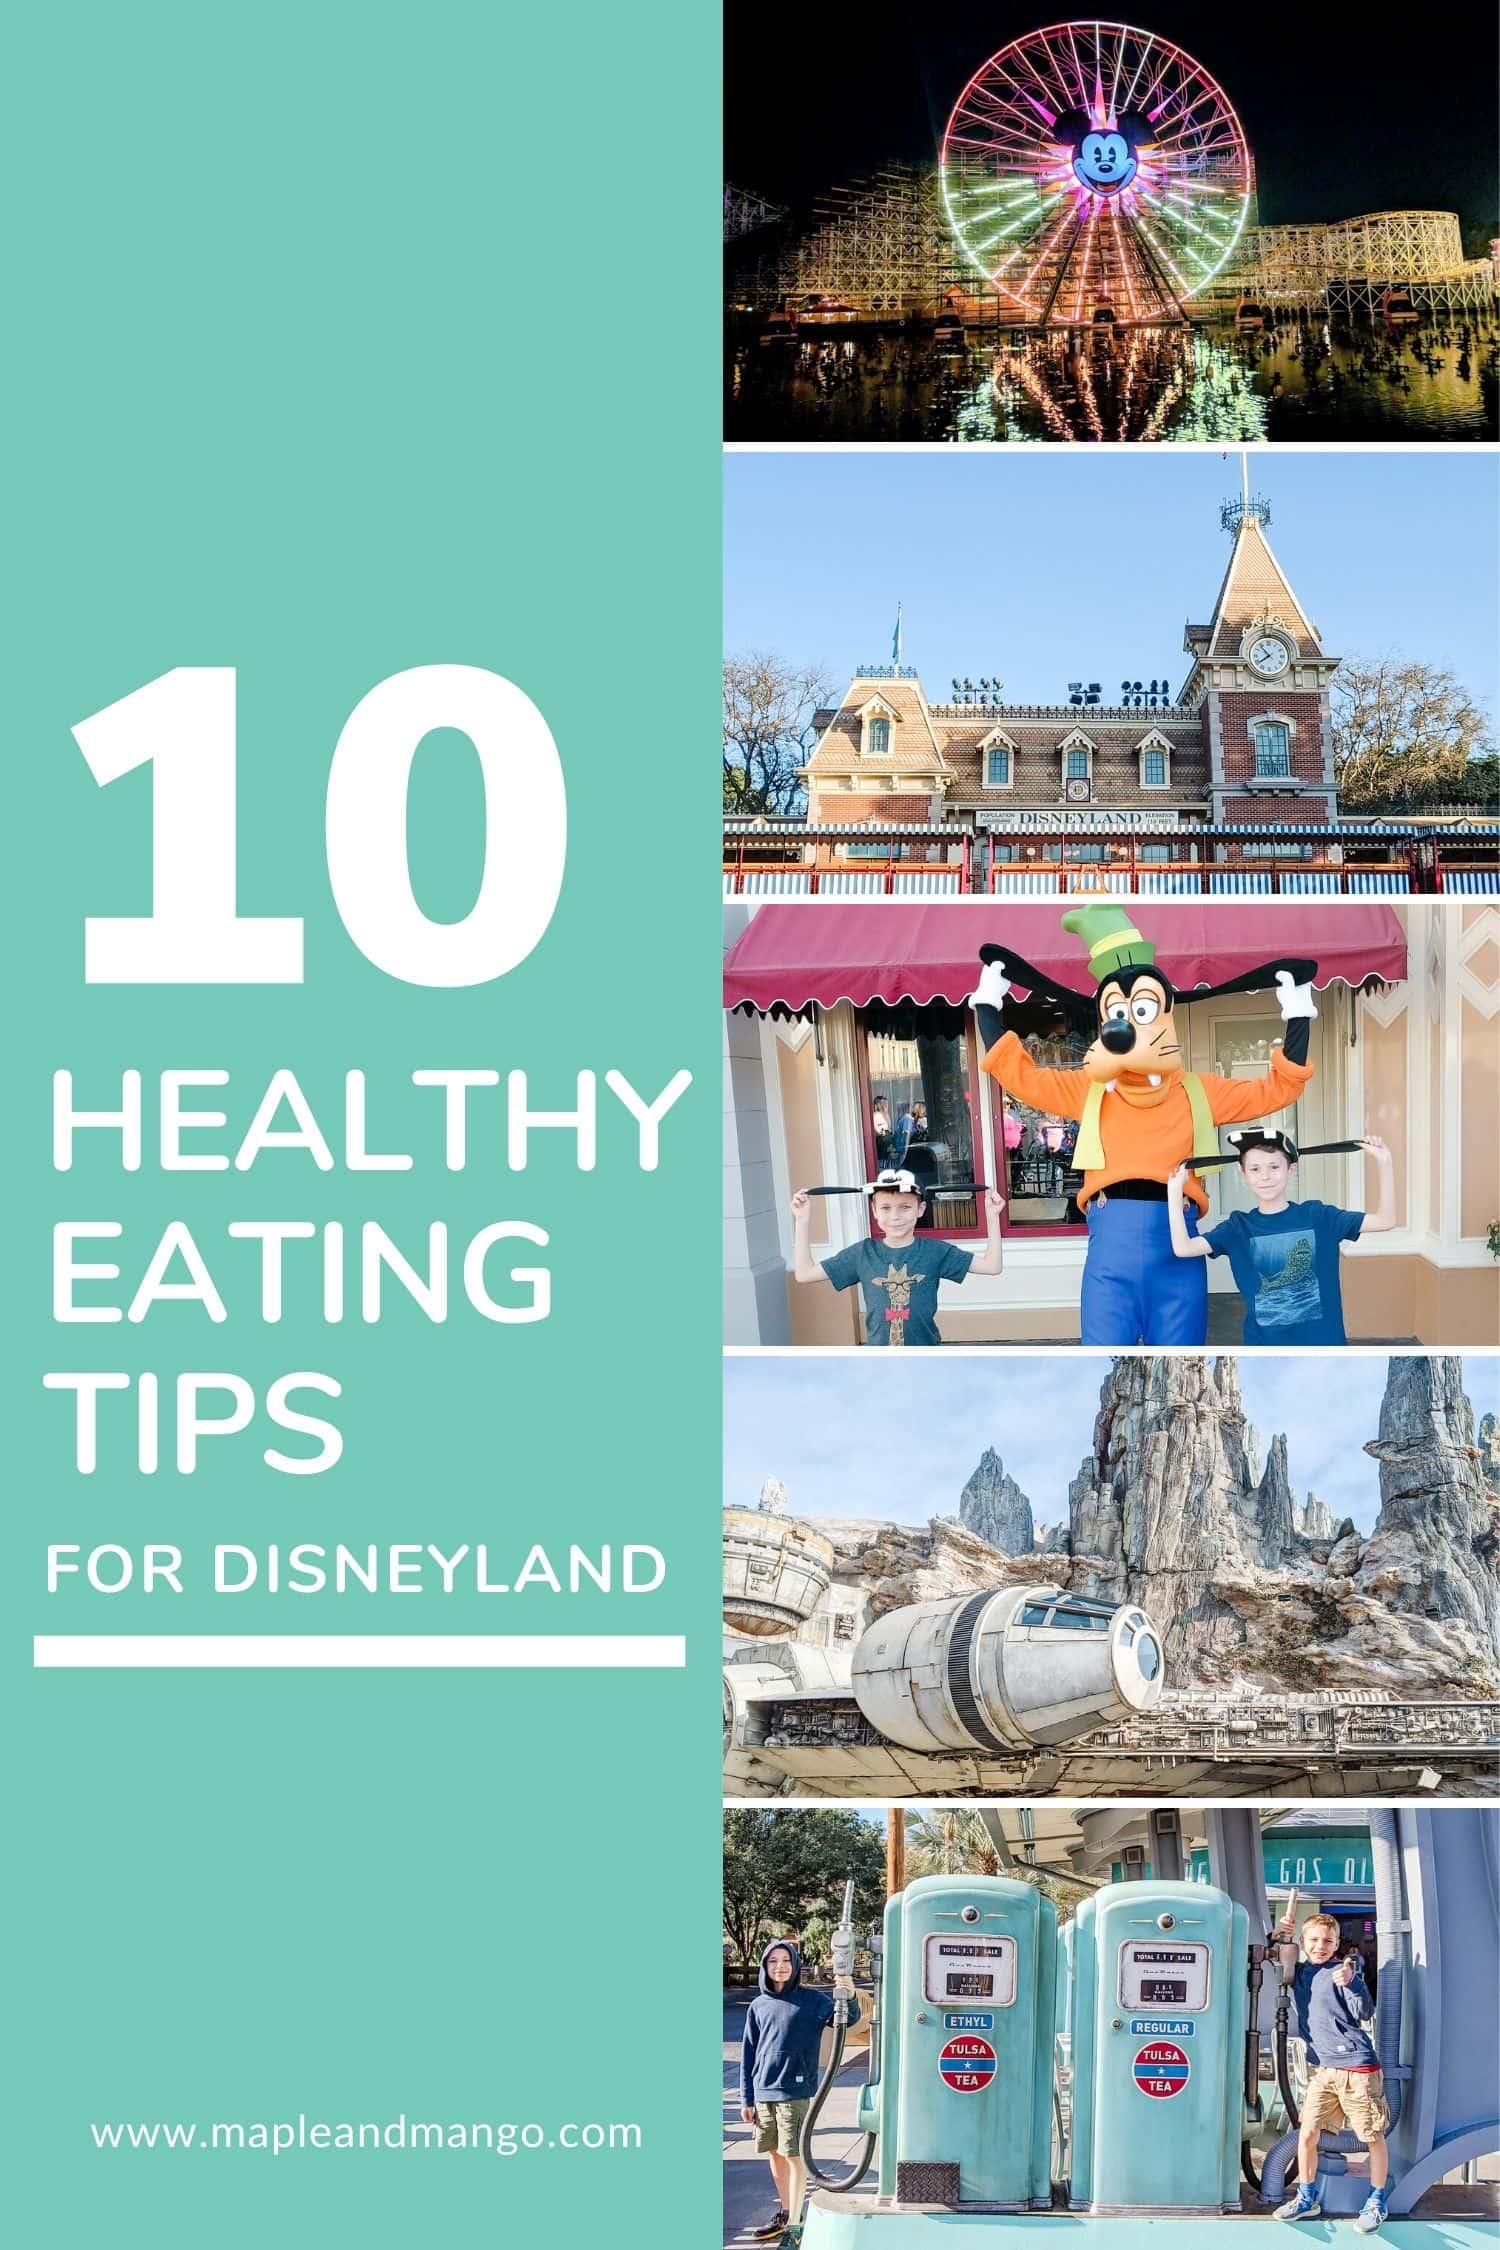 Pinterest image for 10 Healthy Eating Tips For Disneyland